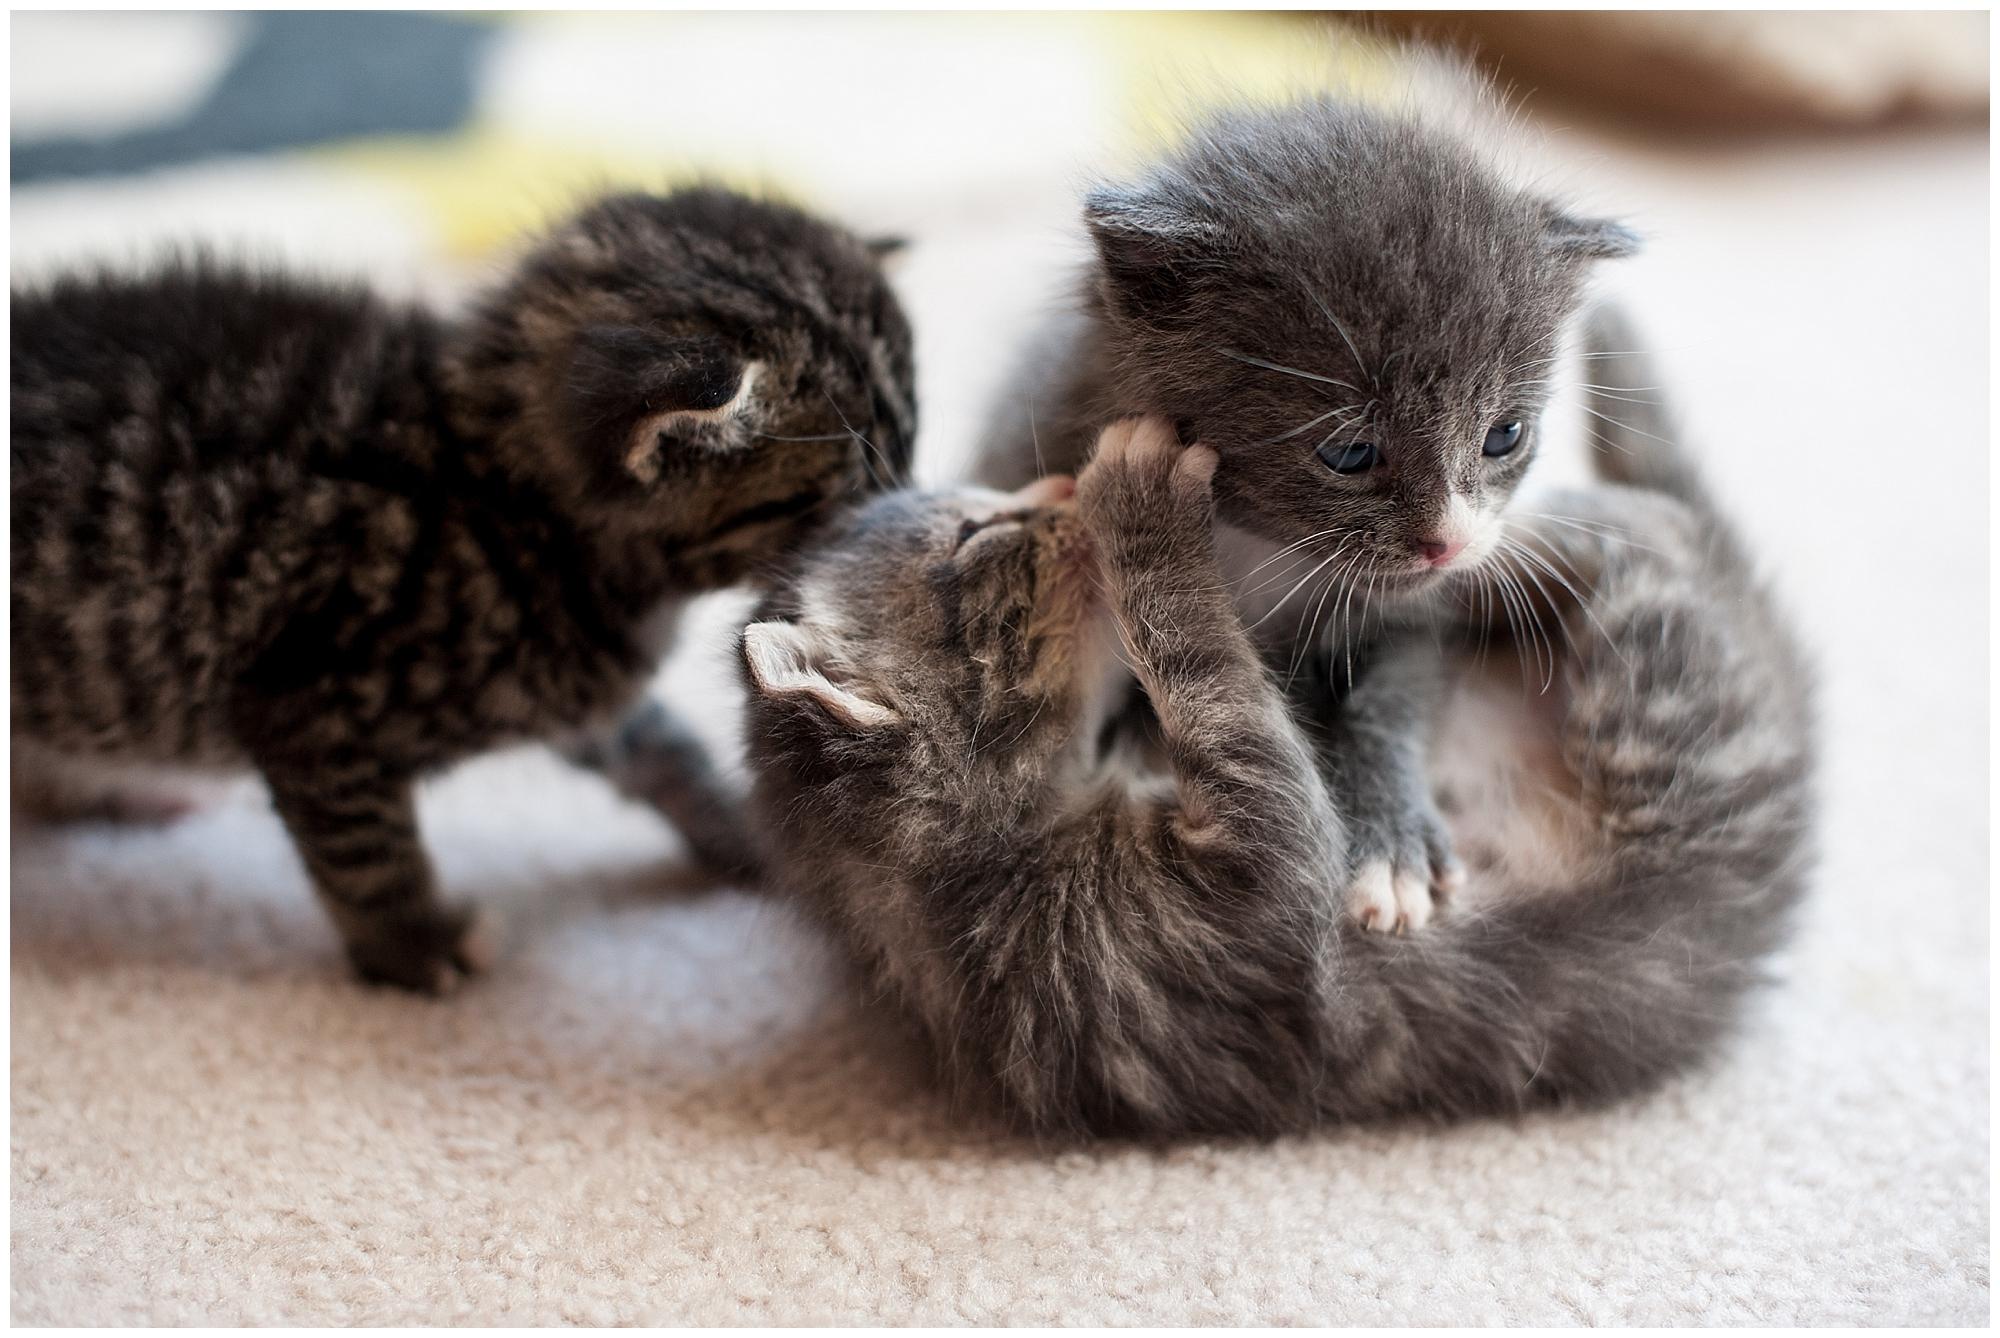 The Adventure of Raising Baby Kittens Part 2